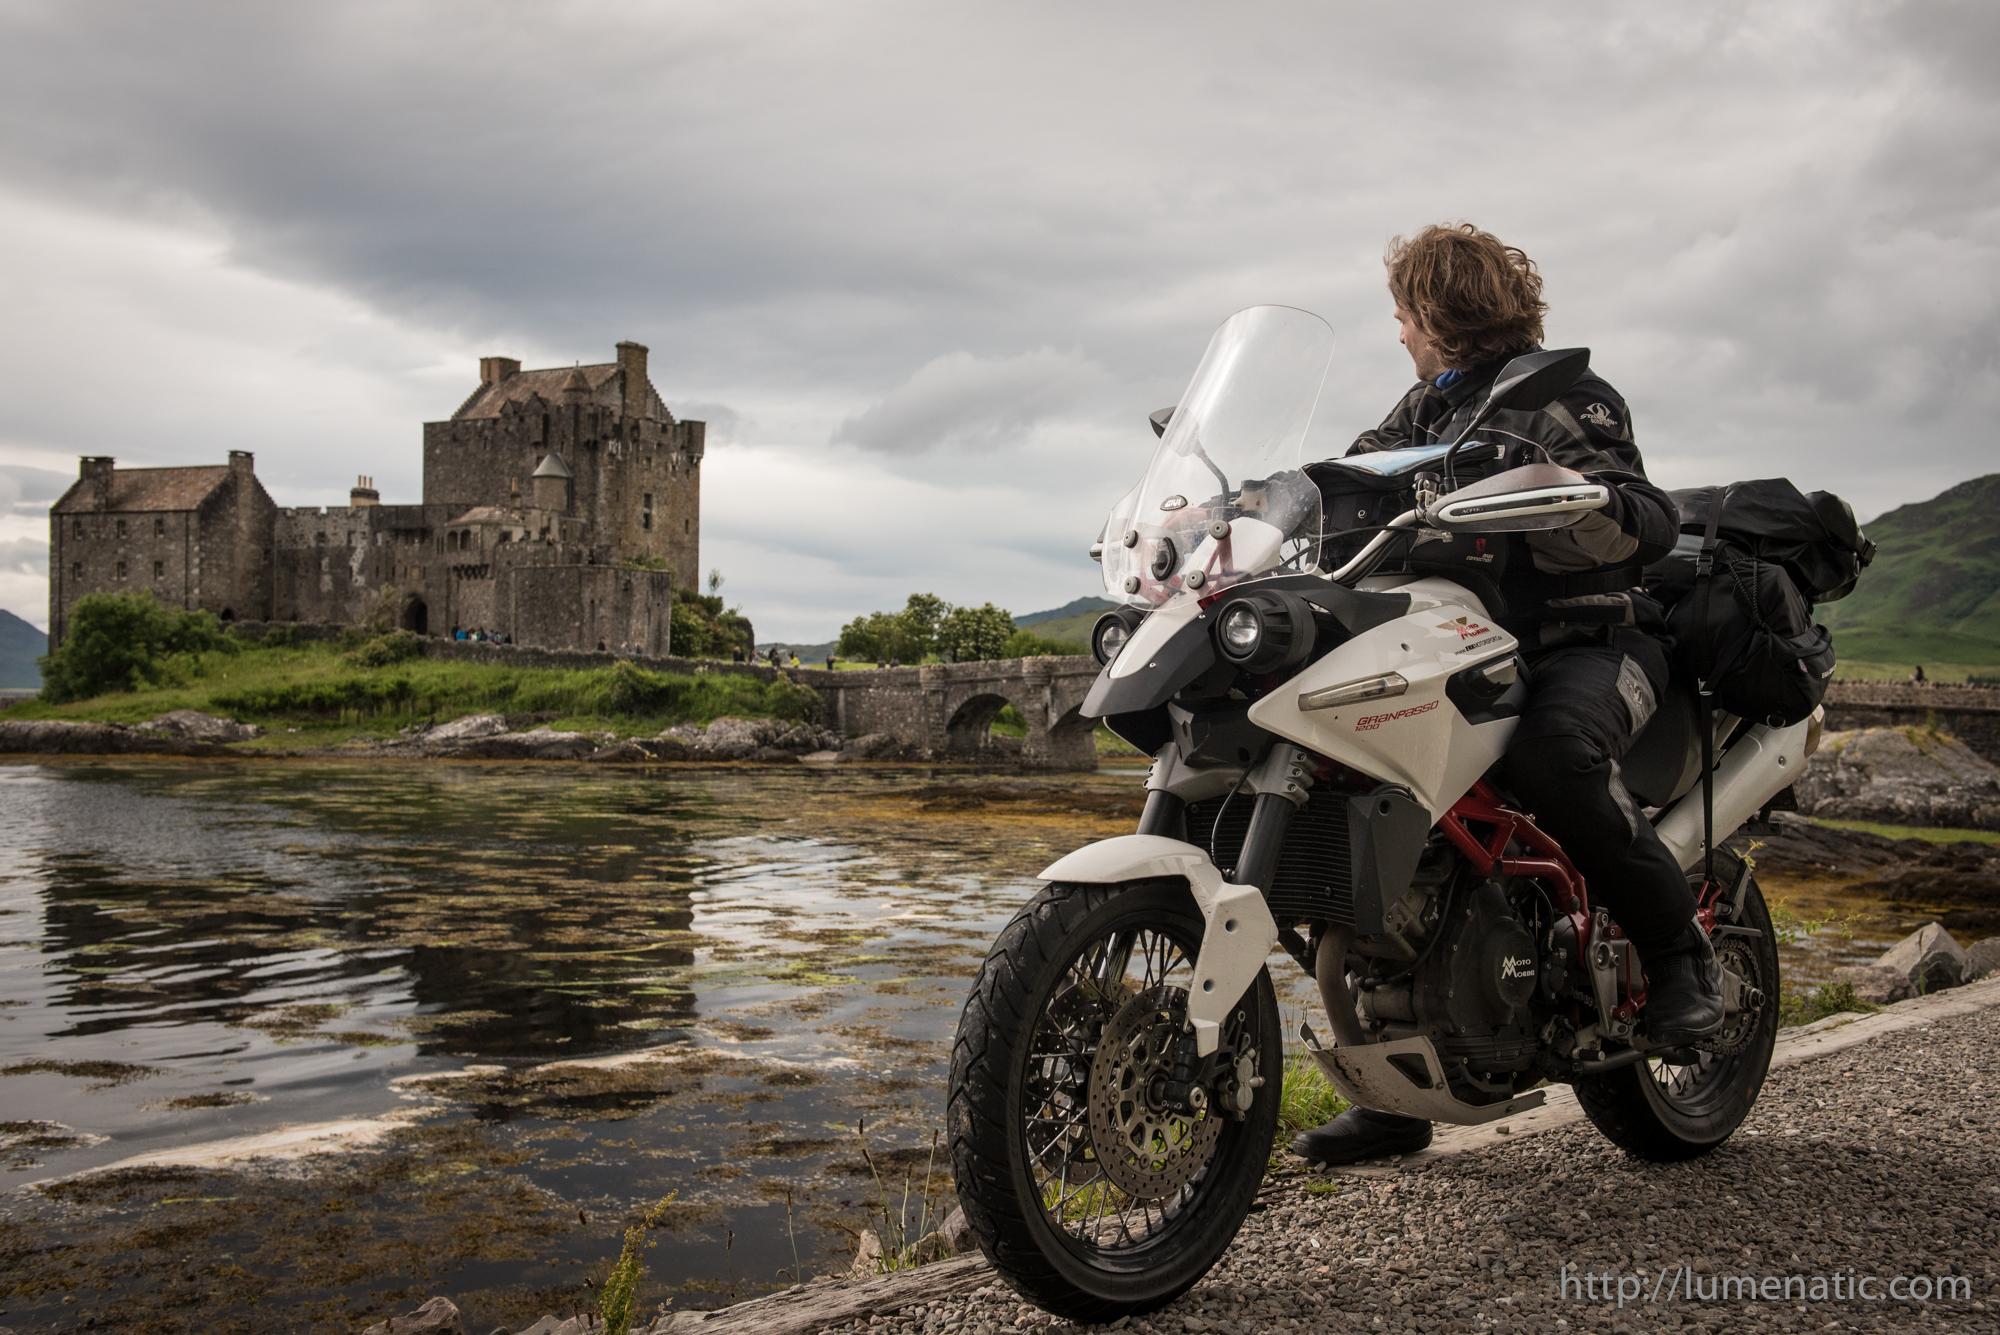 Touring Scotland: The Isle of Skye